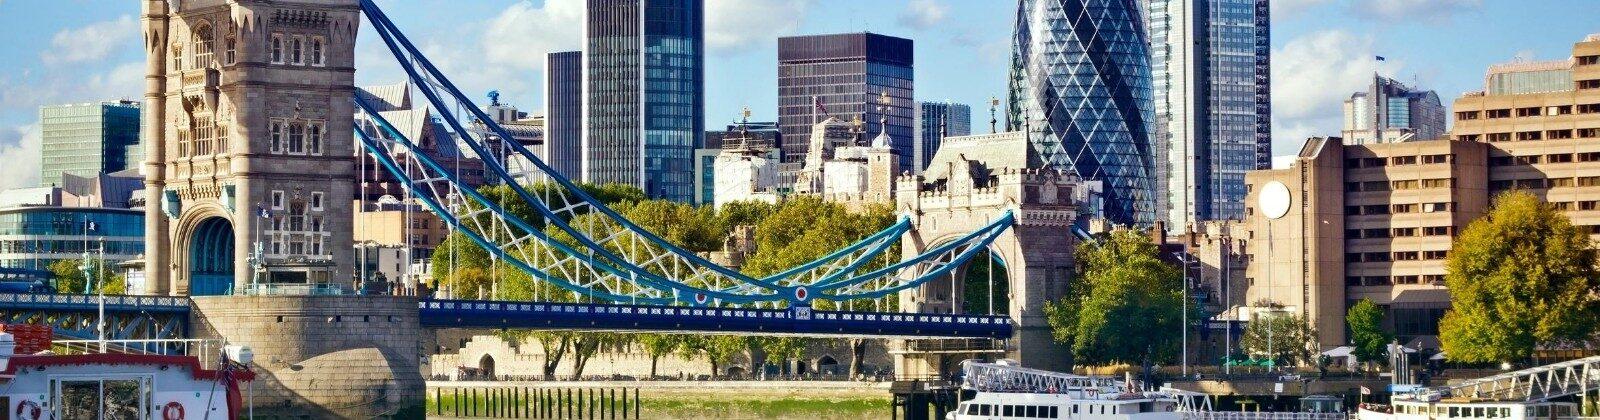 tower bridge london europe